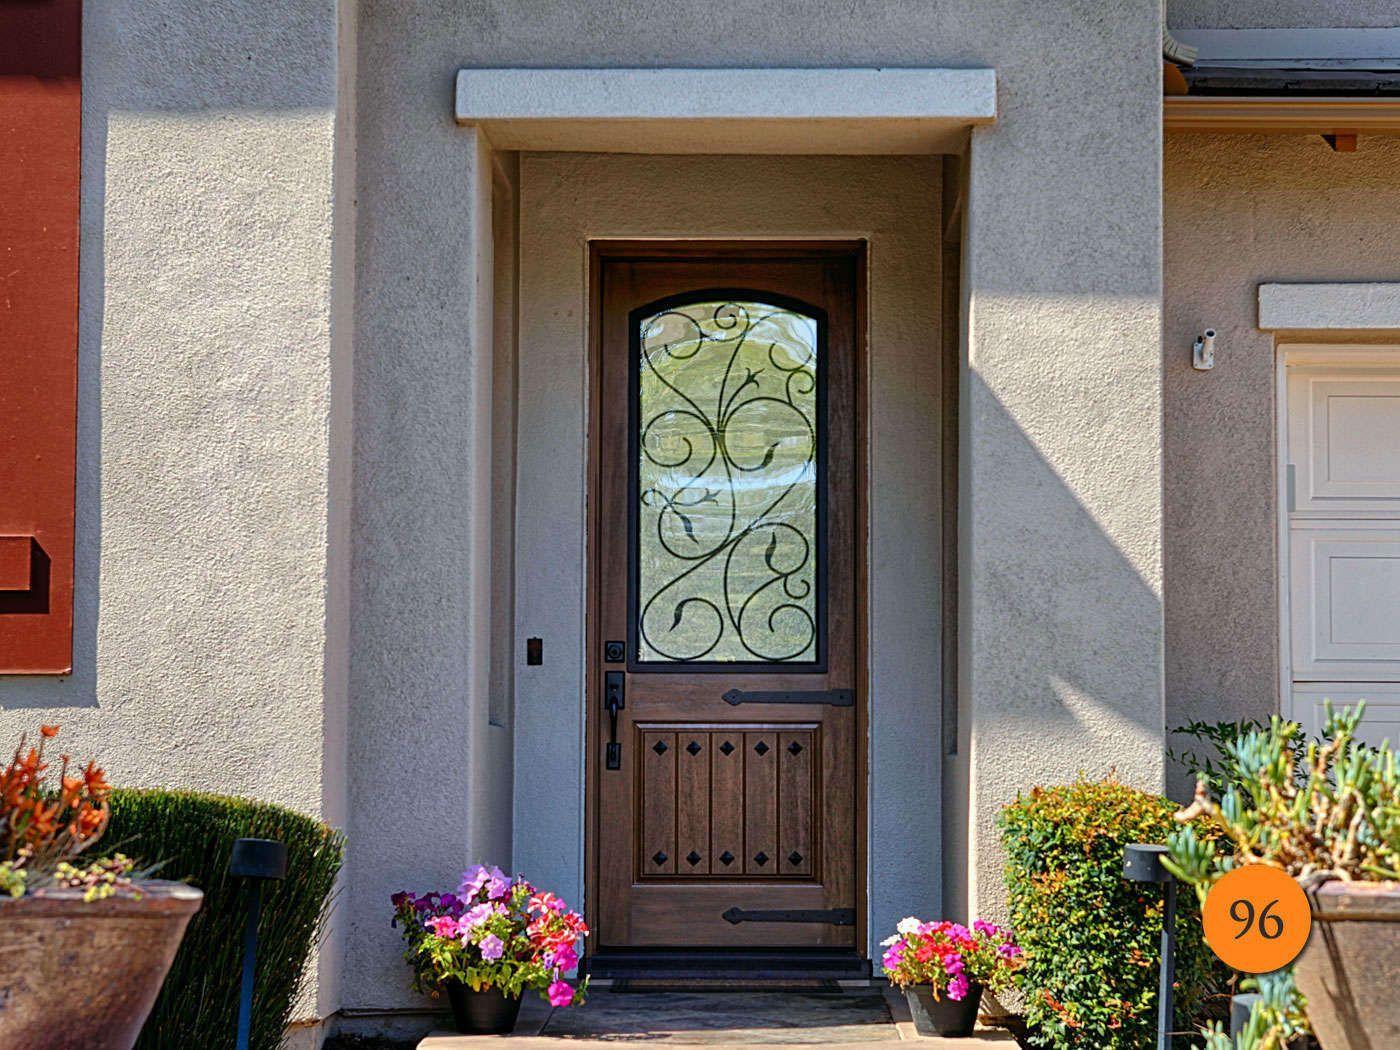 Rustic Entry Doors Fiberglass Fiberglass Exterior Doors Fiberglass Entry Doors Rustic Entry Doors